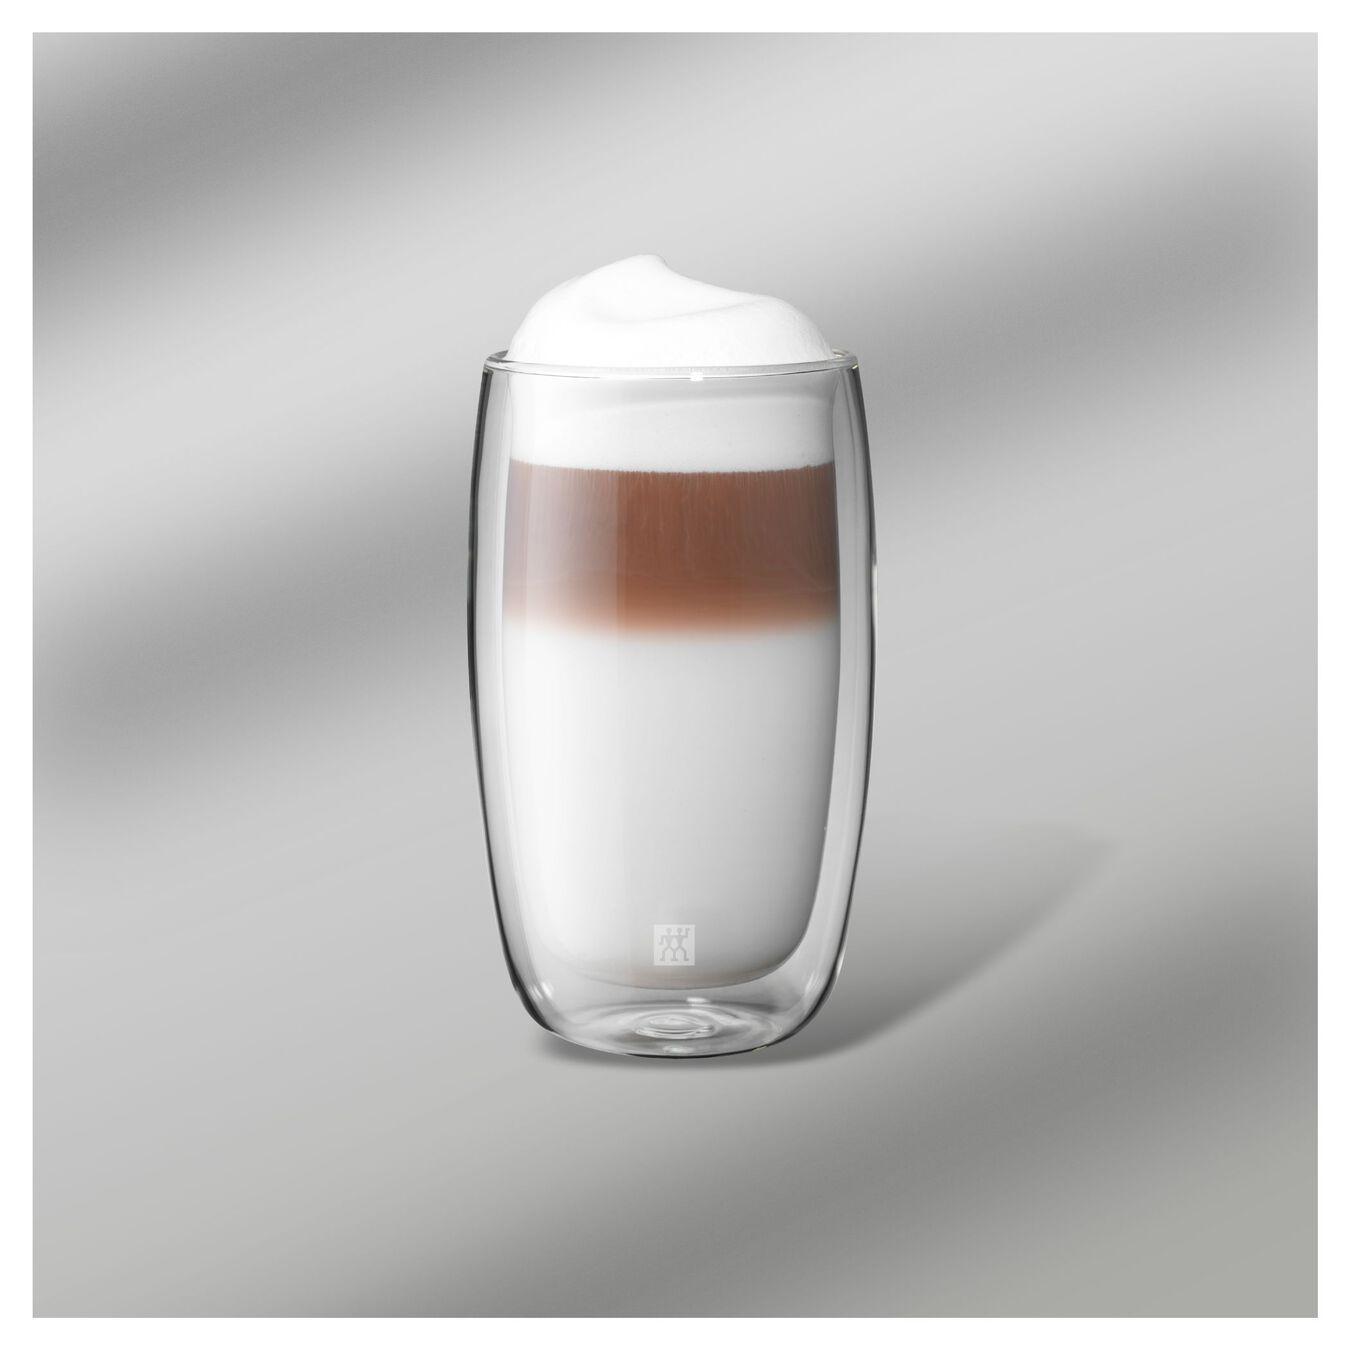 2 Piece Latte glass set,,large 4